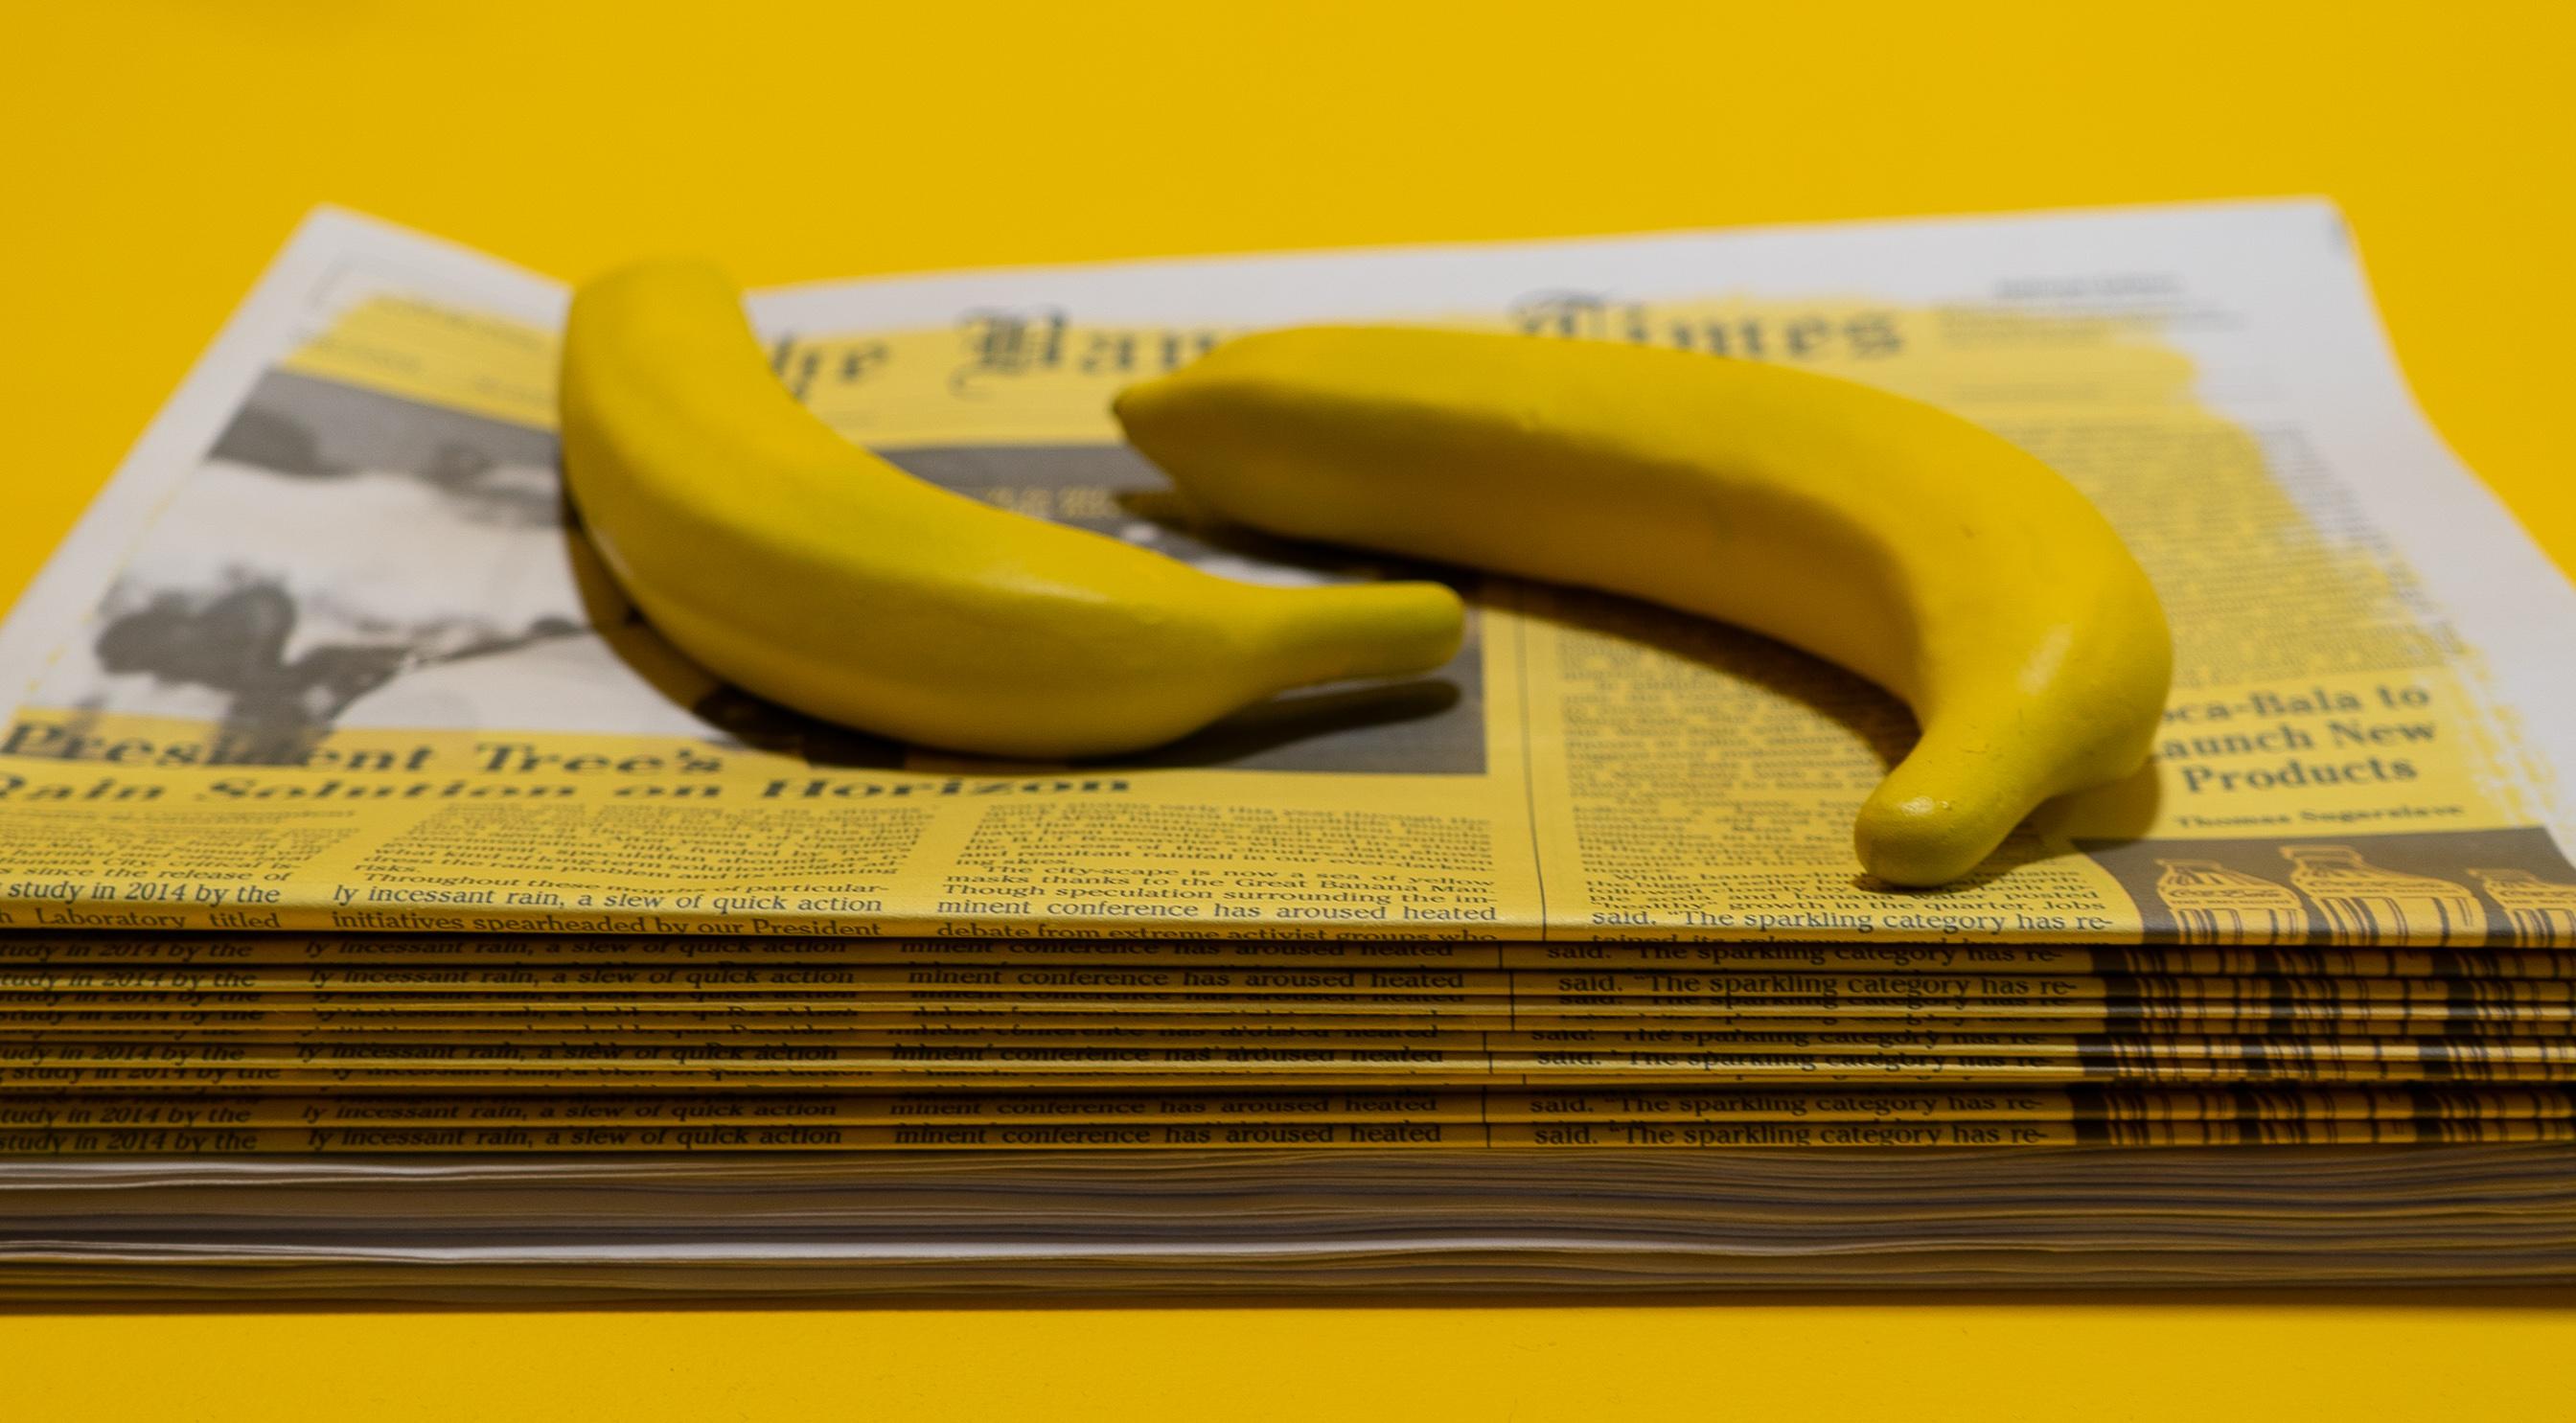 Banana Project 8